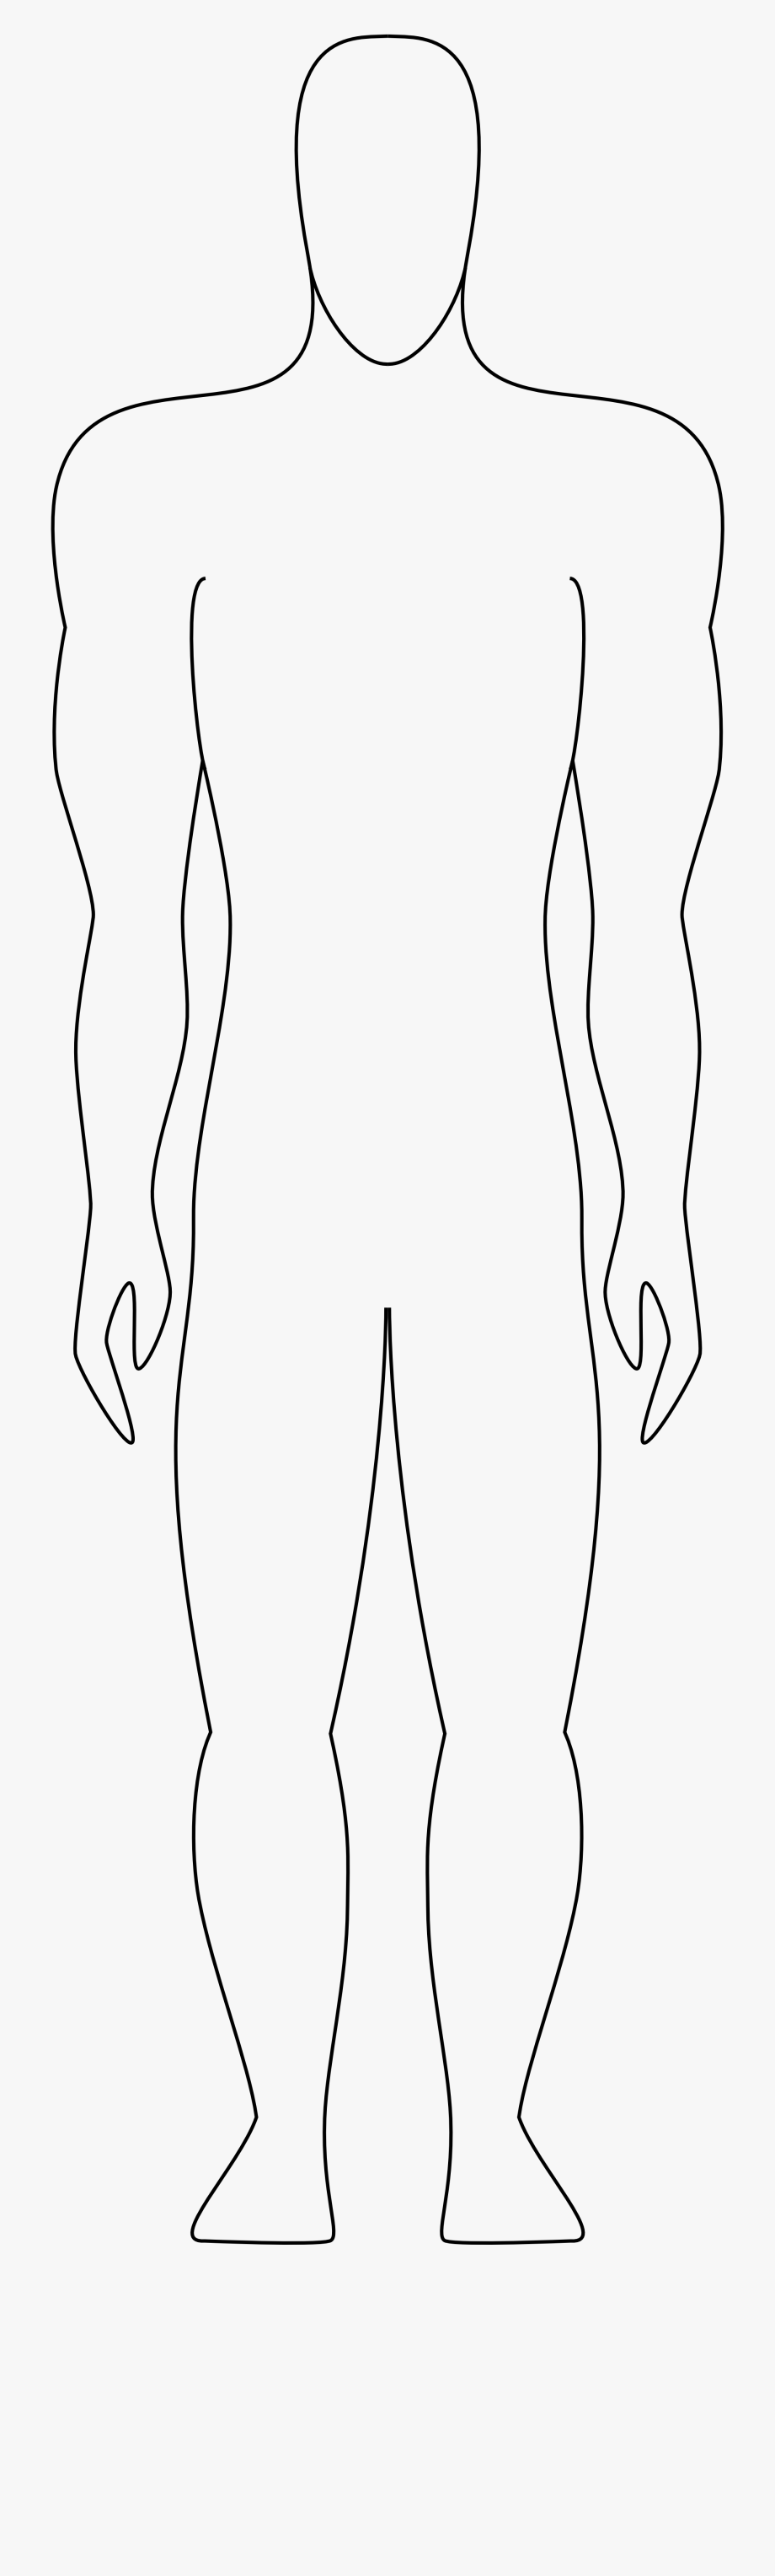 Clipart human body.